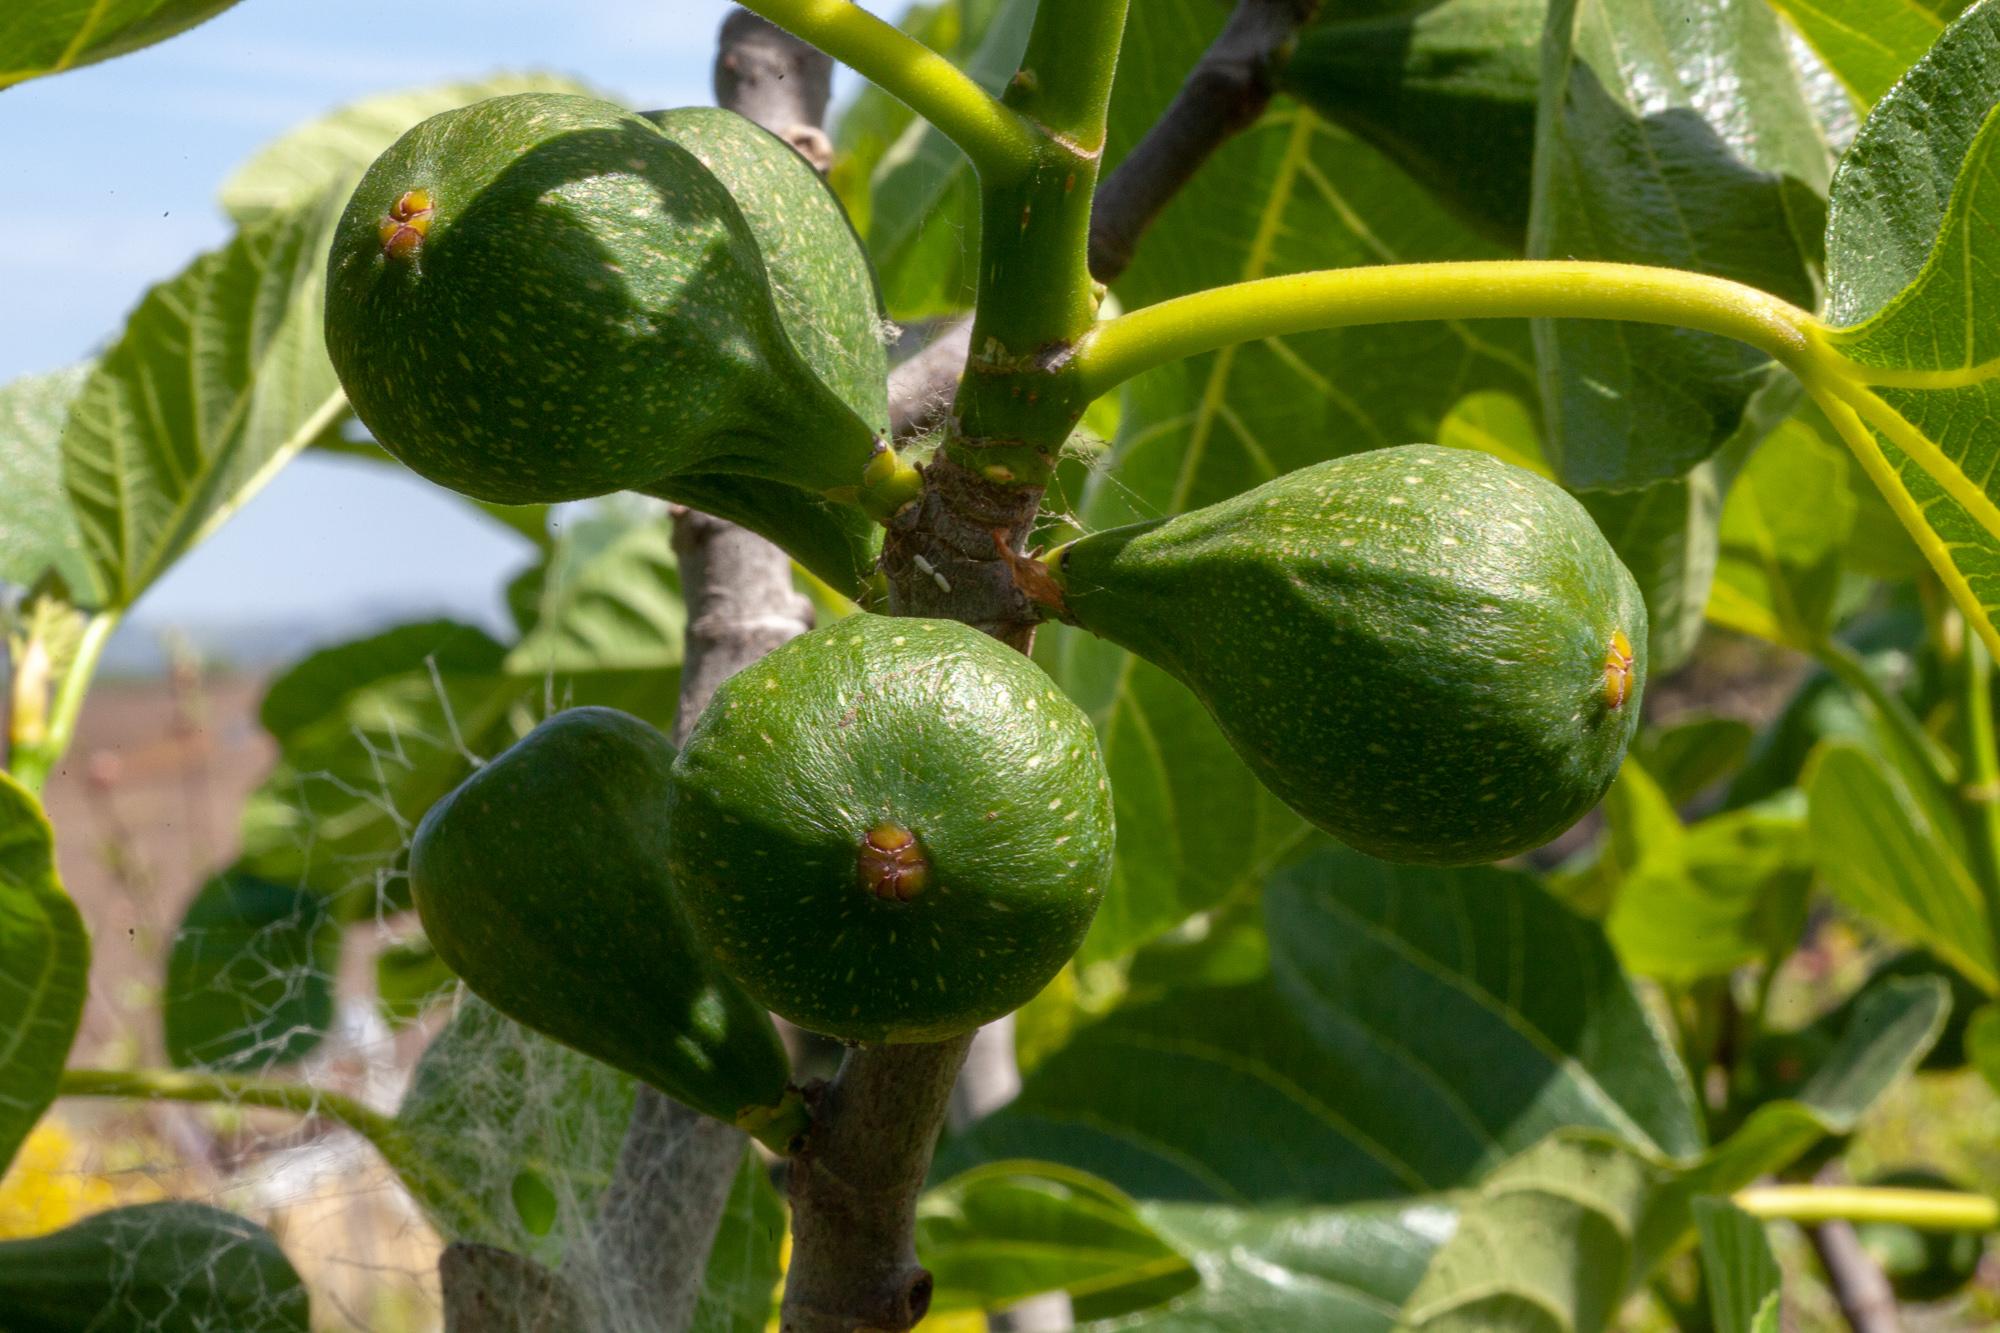 Peter's Honey fig setting a nice breba (spring) crop